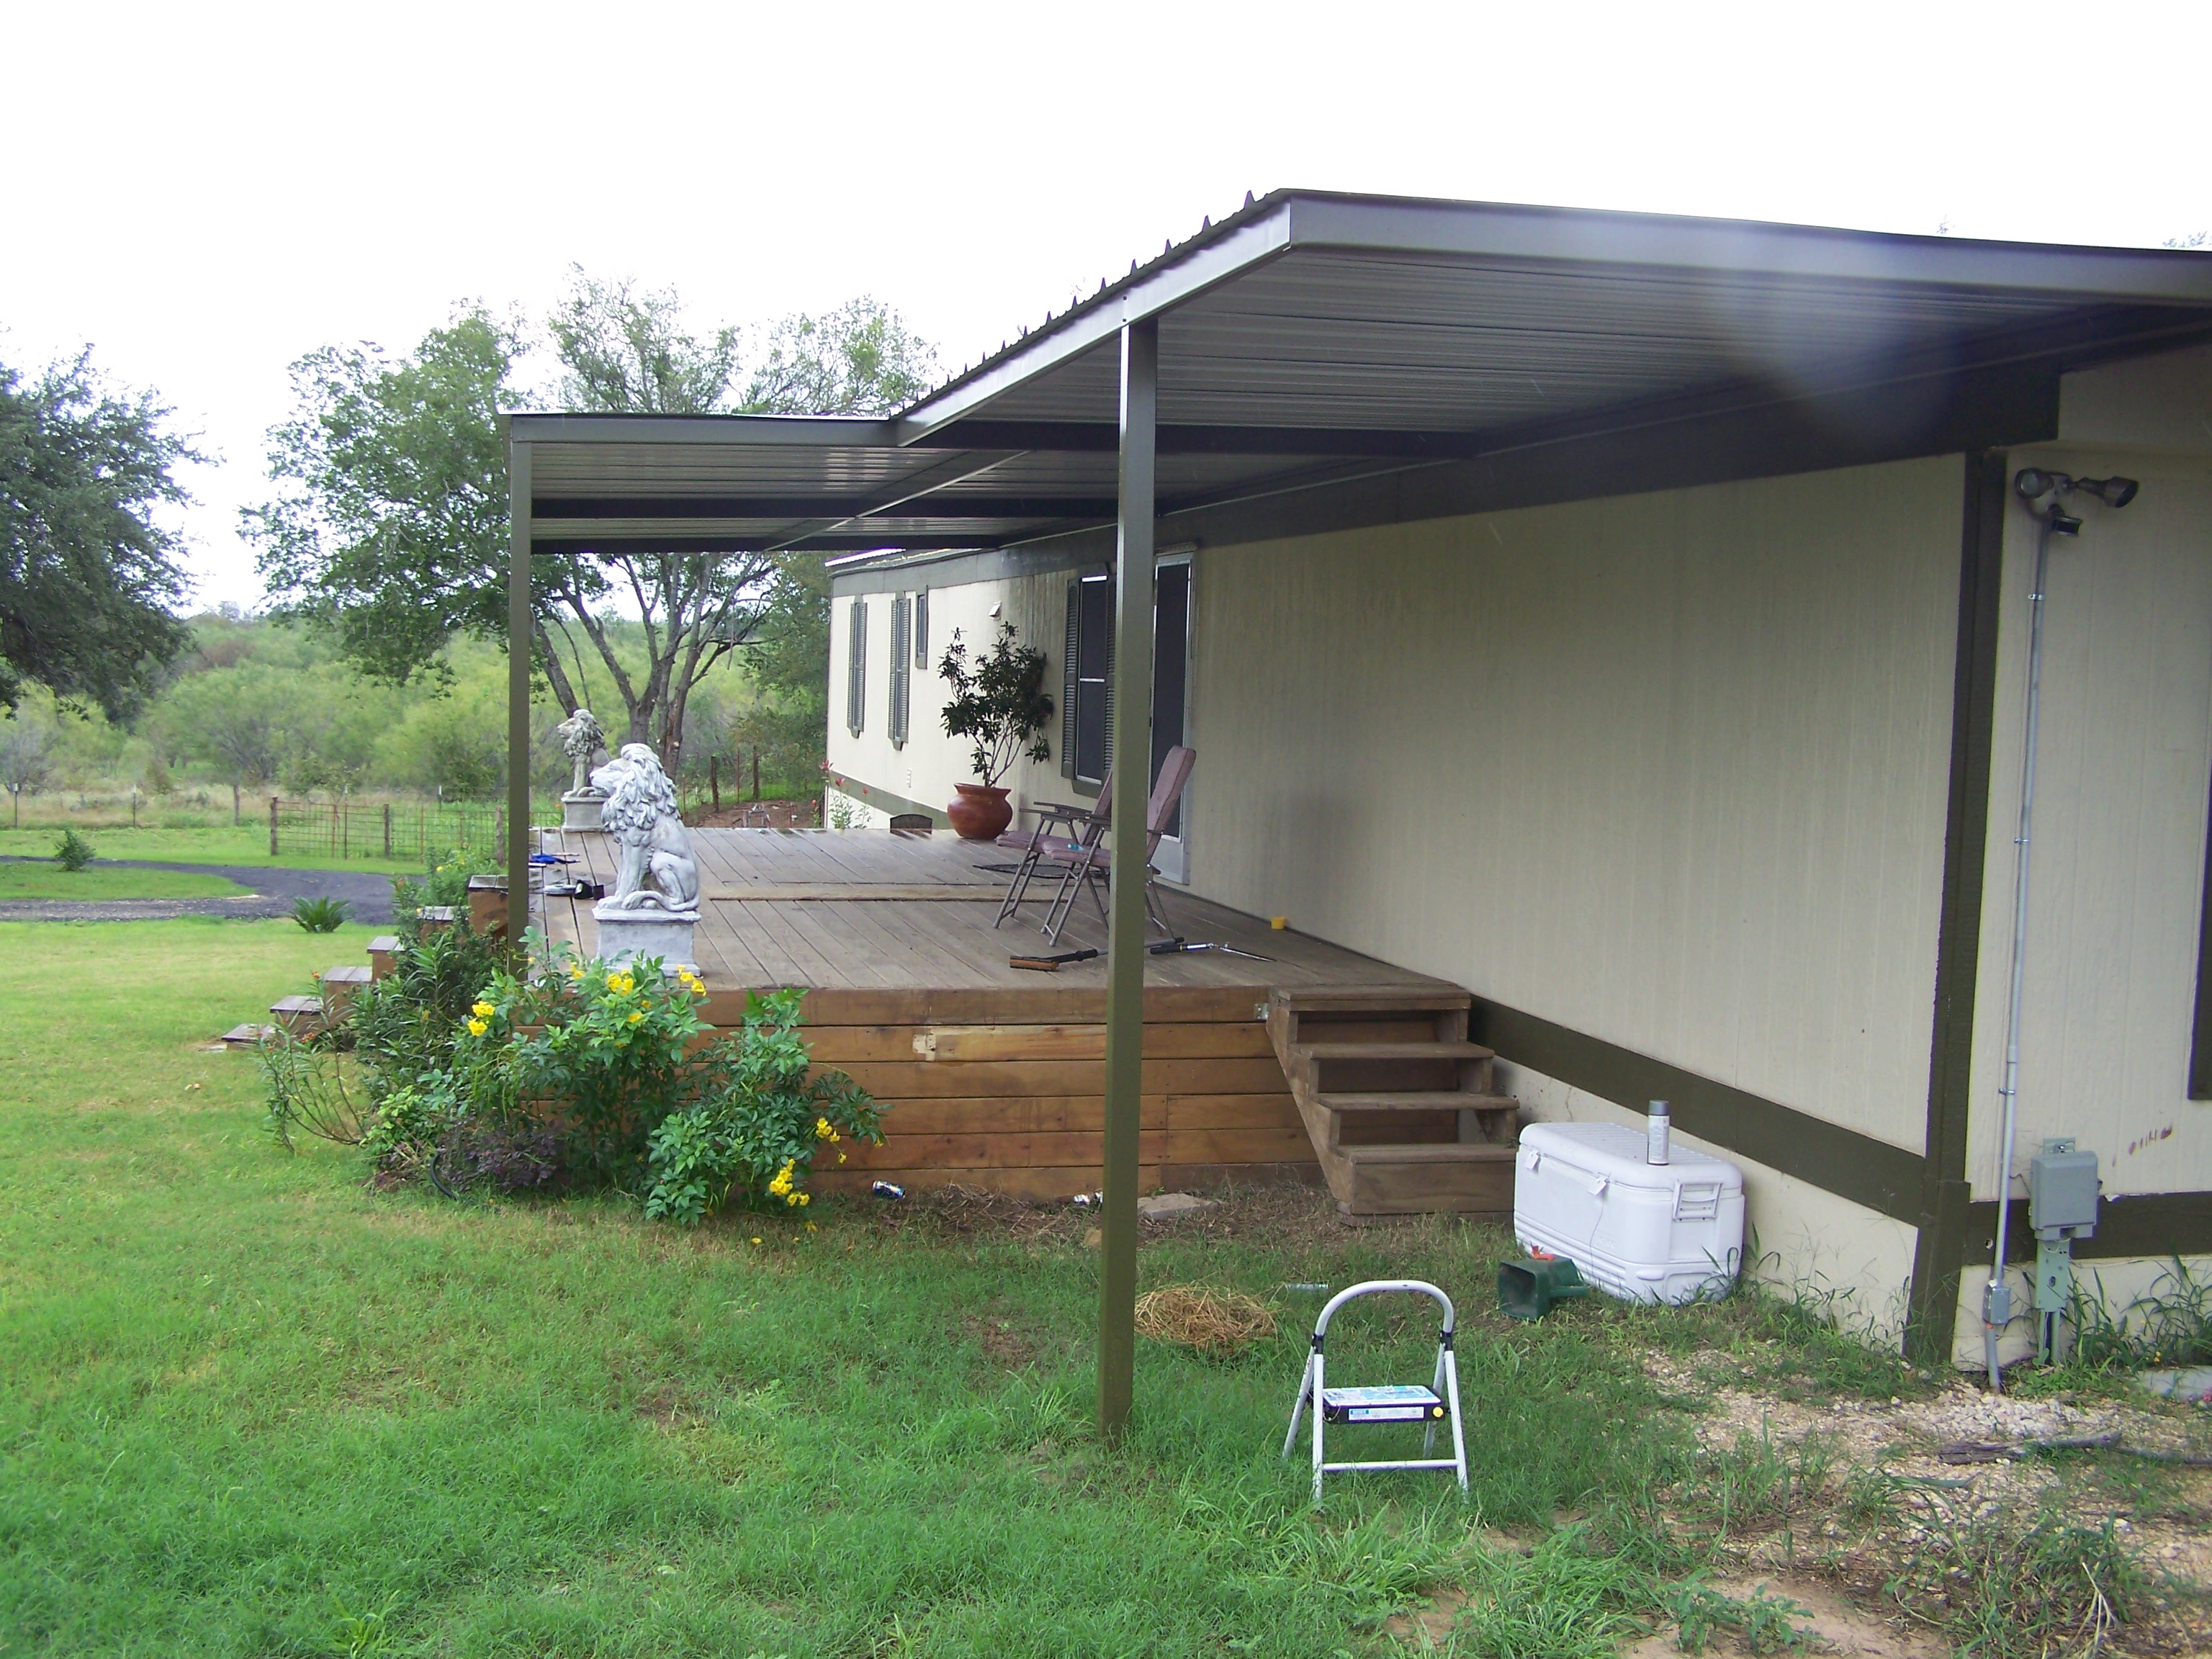 Aluminum Carport Awnings : Mobile home metal roof awning carport la vernia